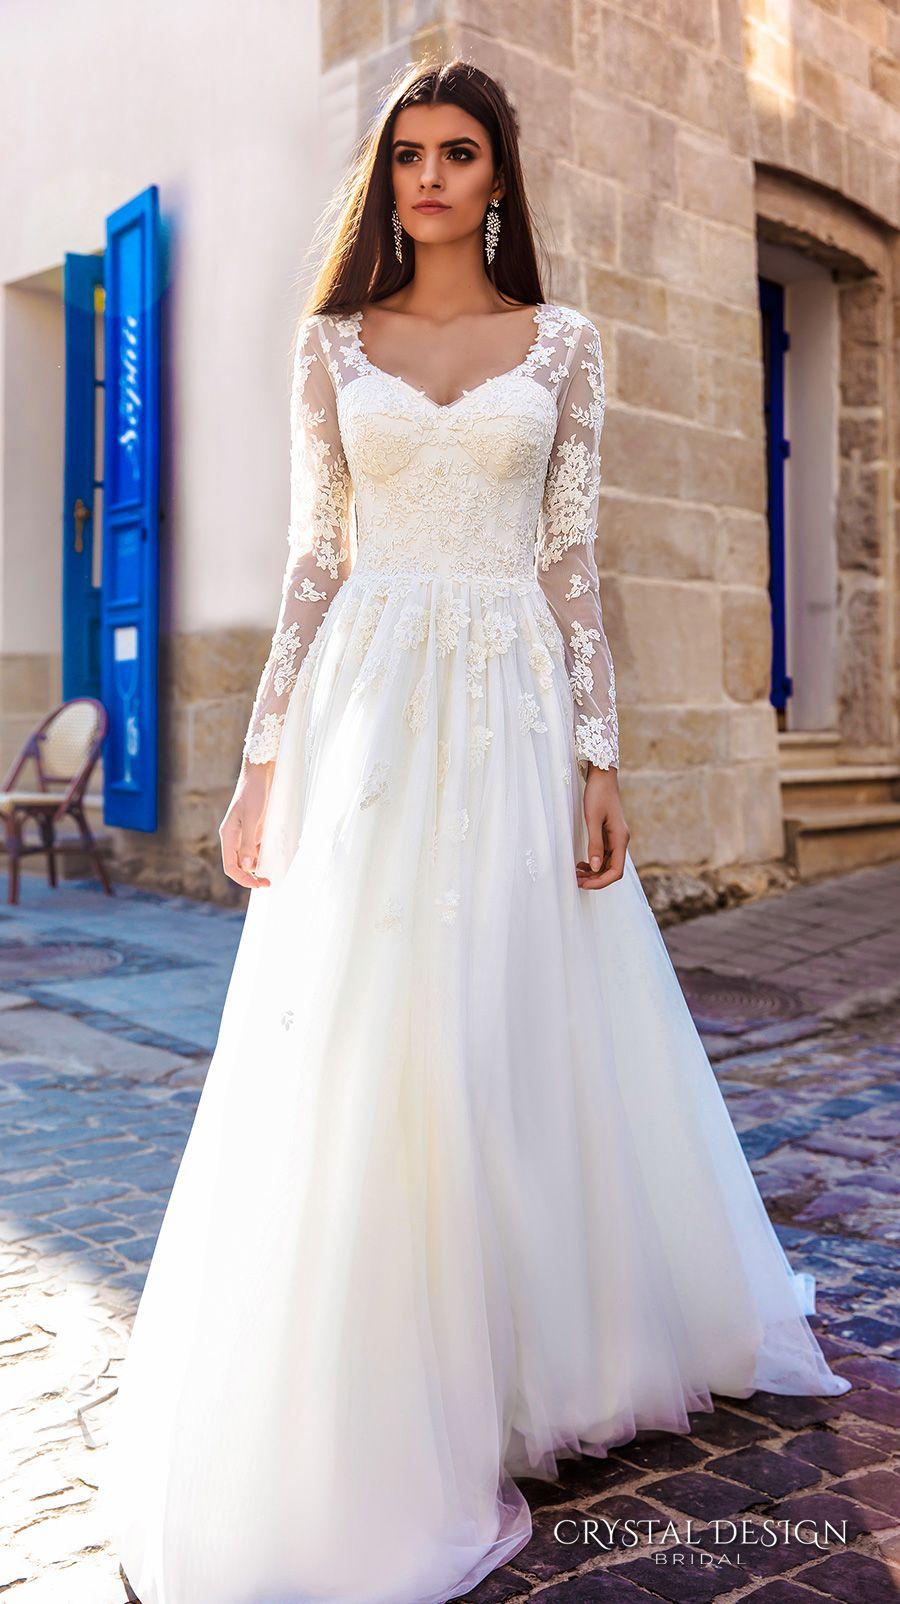 sheer top wedding dress Bridal